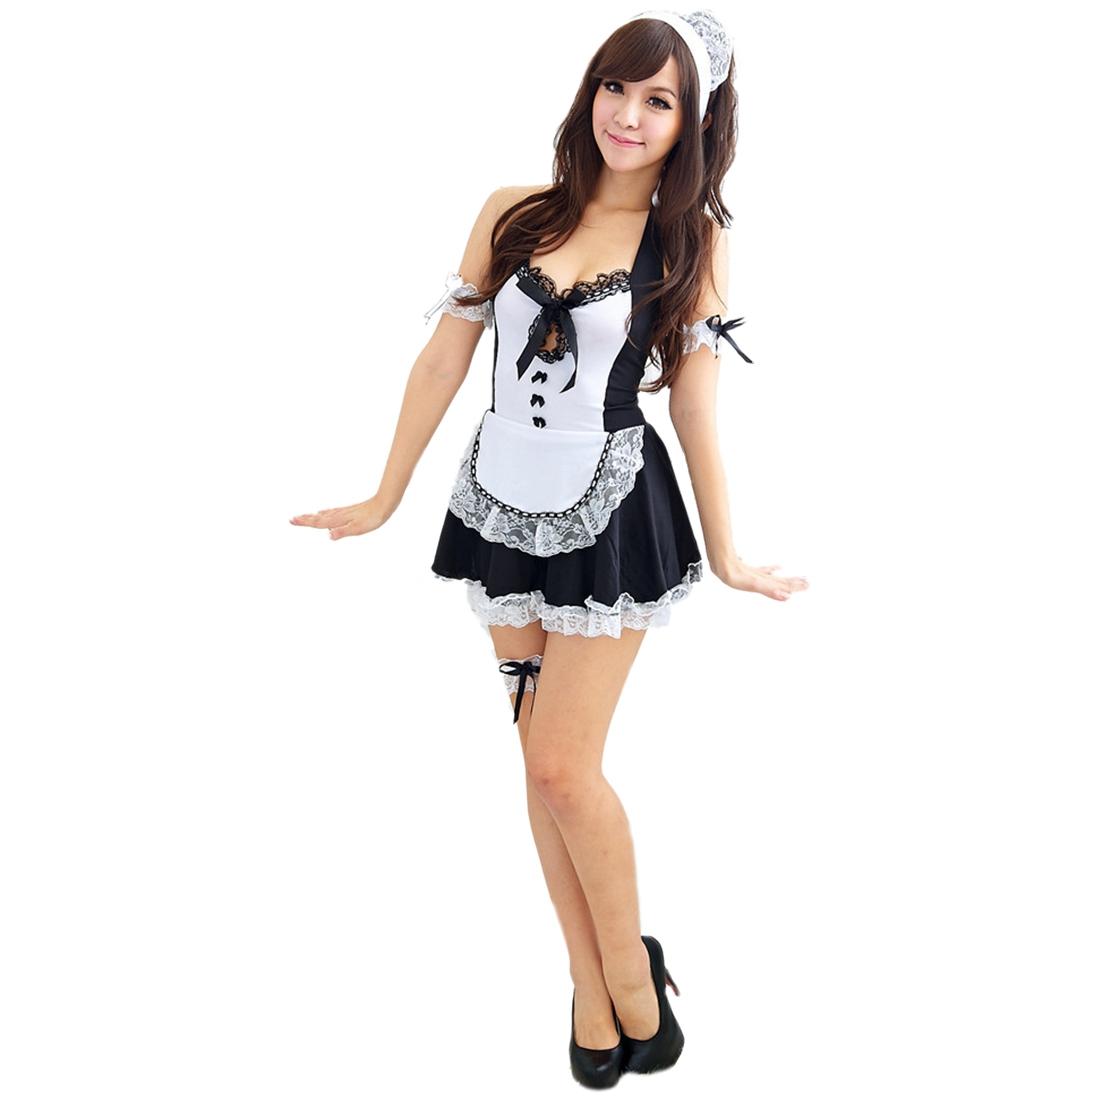 damen spitze suess dienstmaedchen kleidung anime cosplay kostueme uniform de ebay. Black Bedroom Furniture Sets. Home Design Ideas